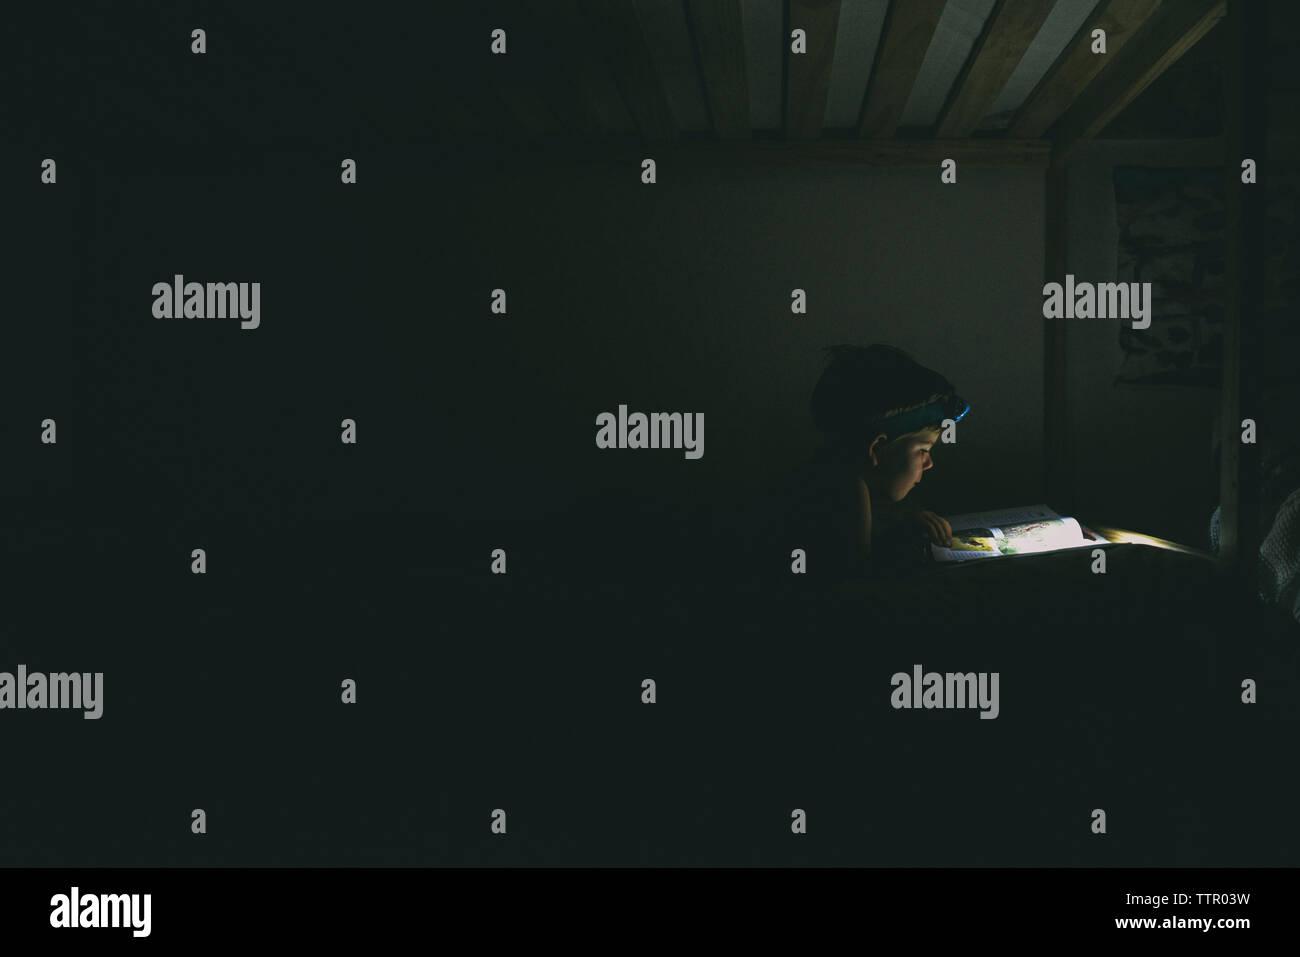 Boy using headlamp while reading book in darkroom - Stock Image